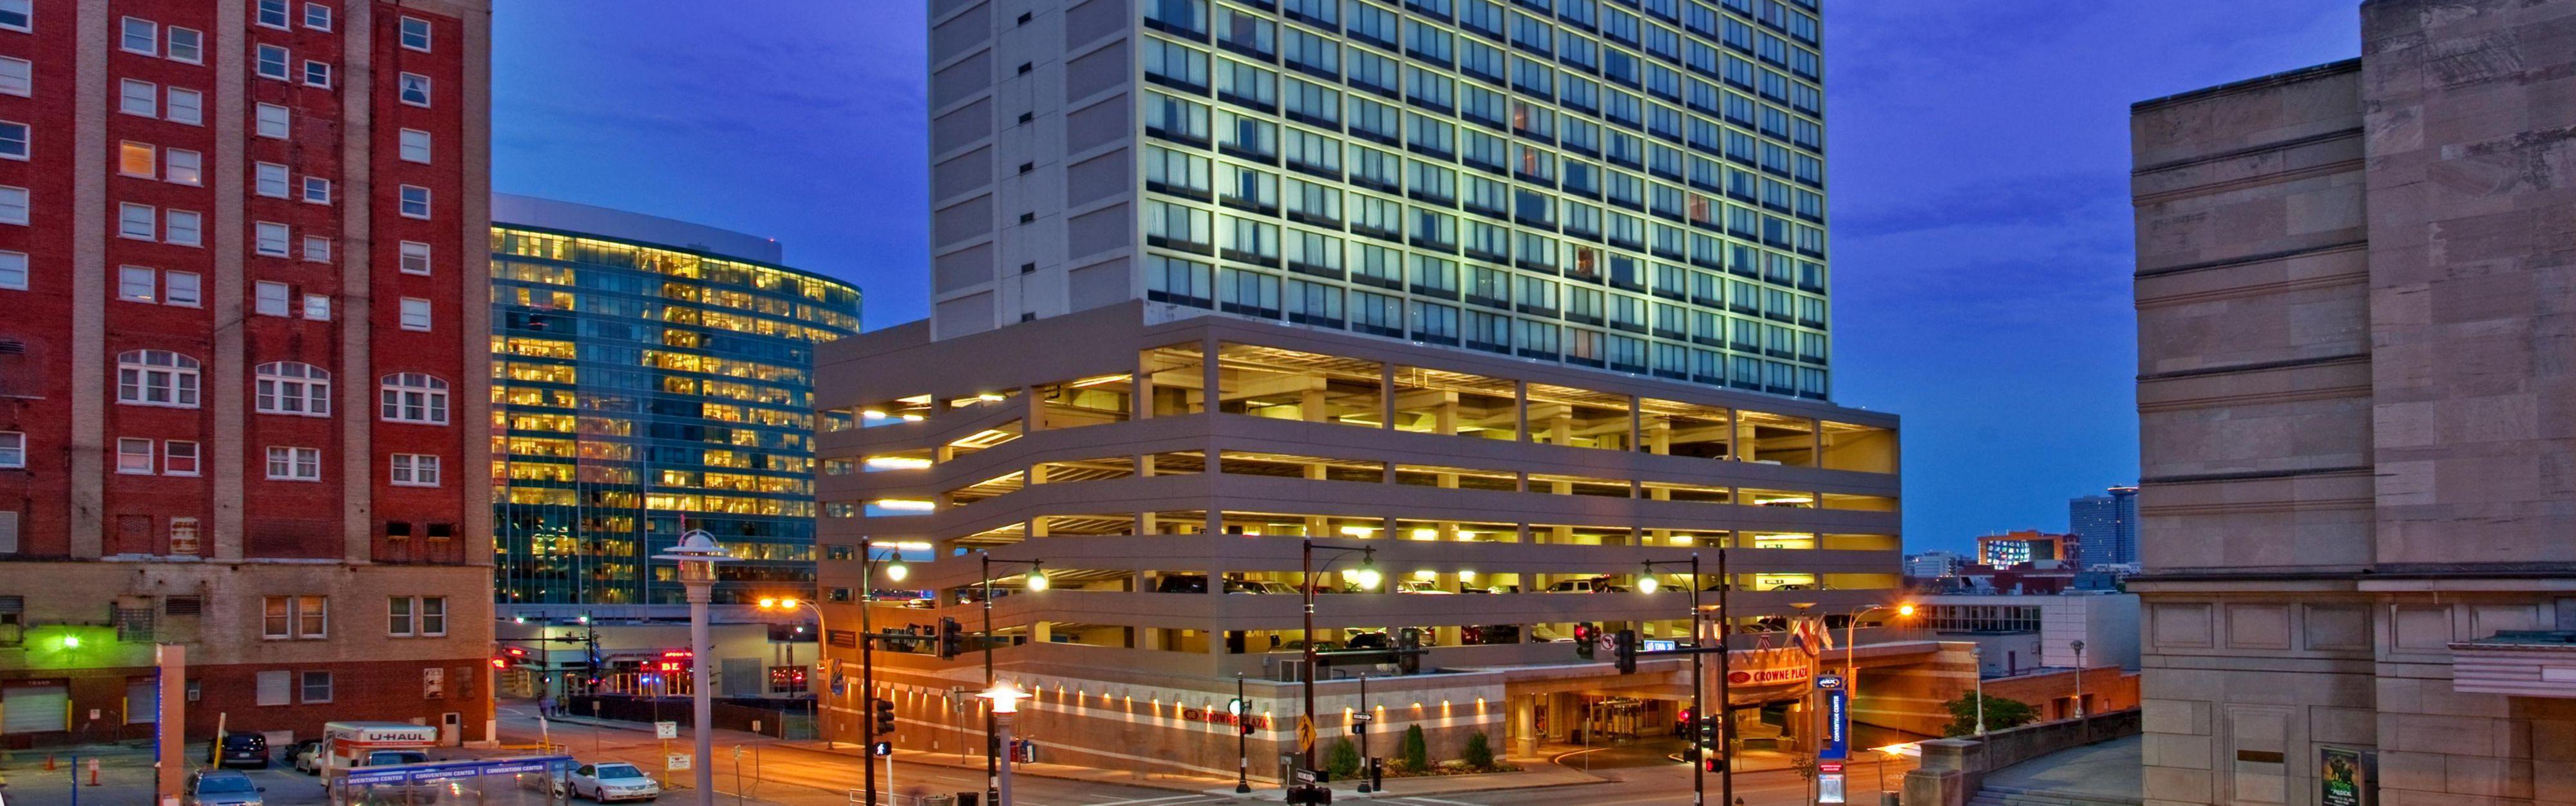 Crowne Plaza Kansas City Downtown image 0